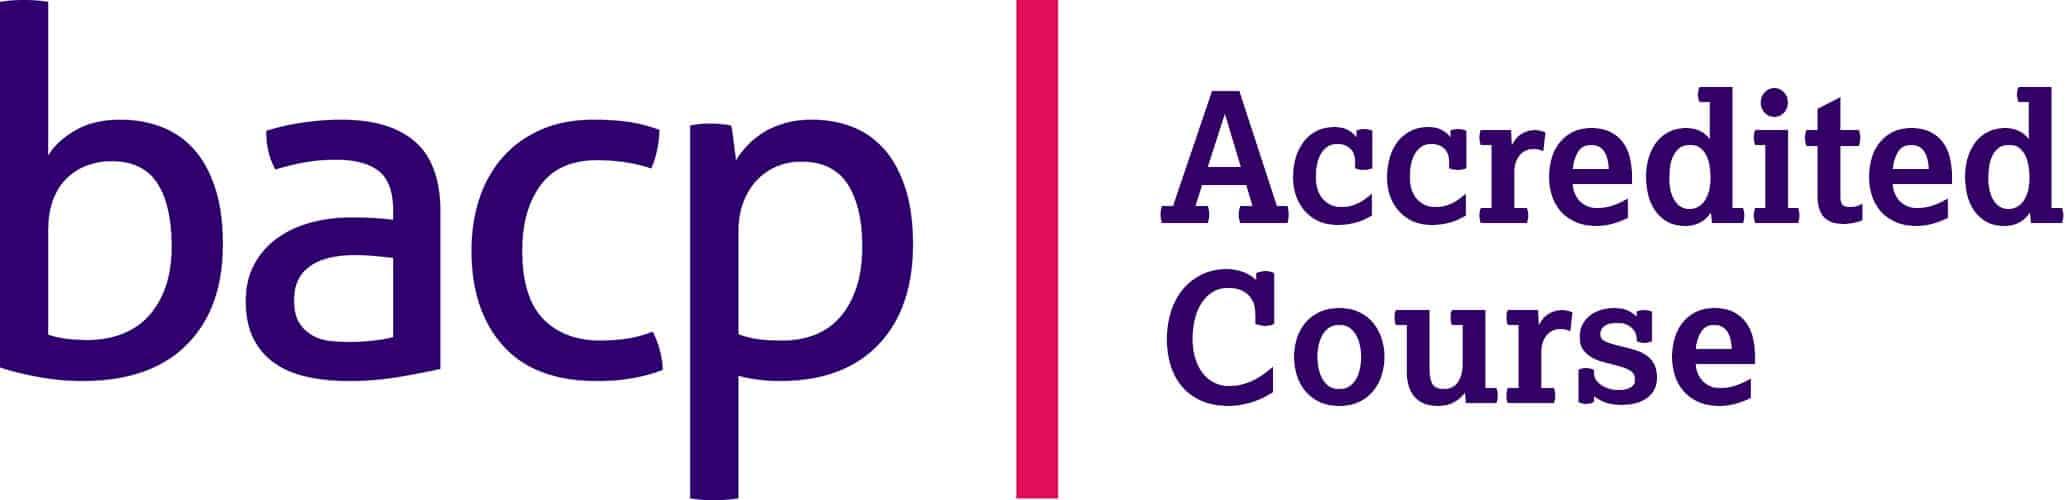 accred-course-colour